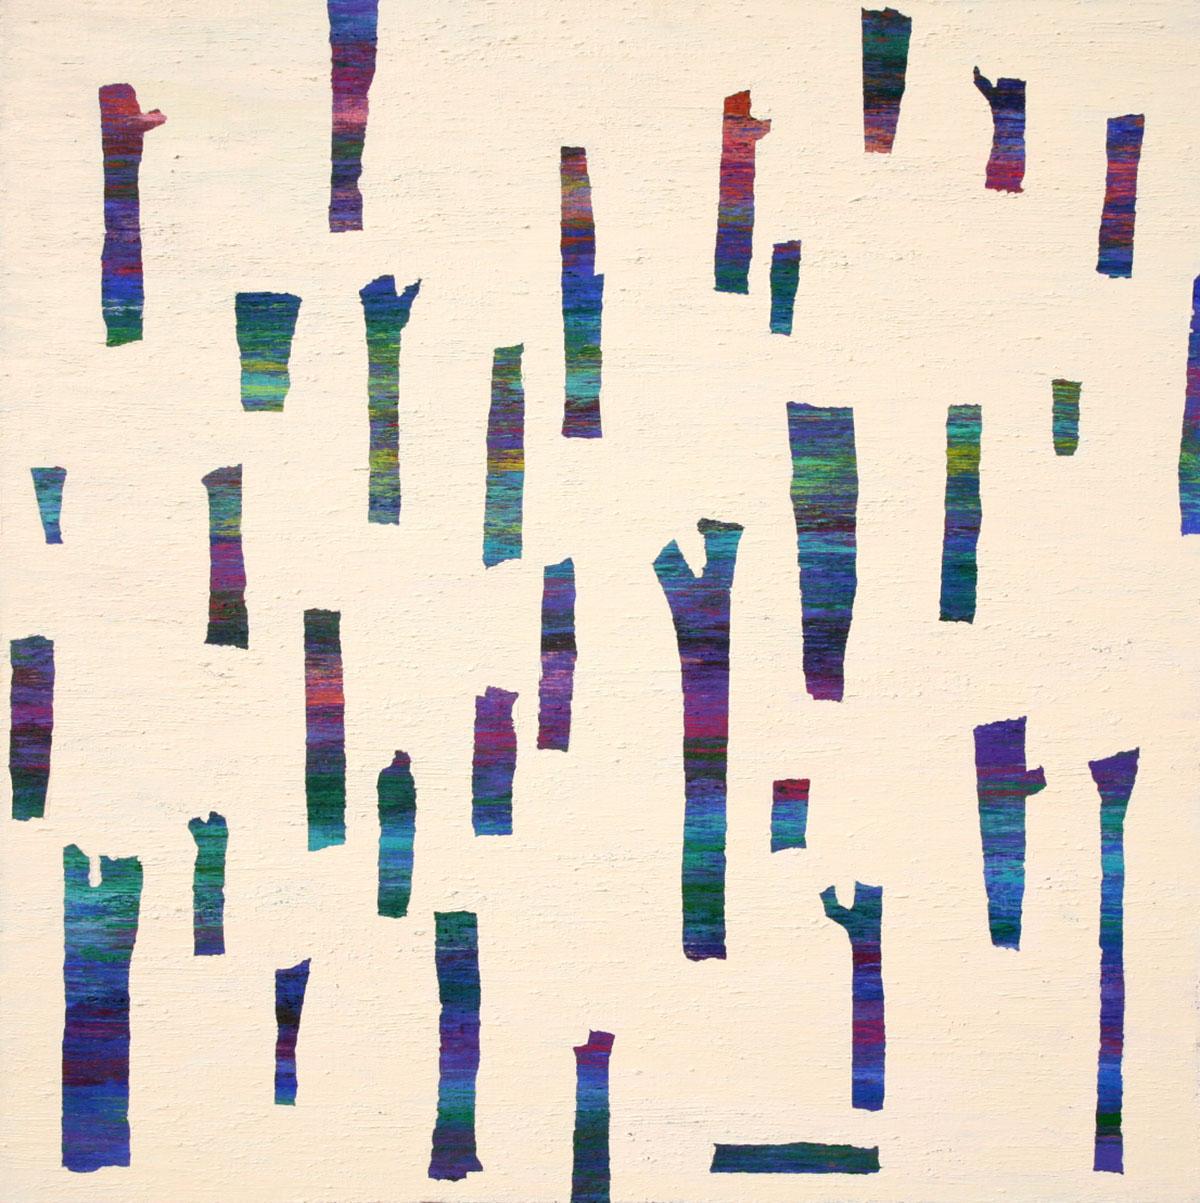 Dreaming Tree︱90.0x90.0cm, Acrylic on Canvas︱2018